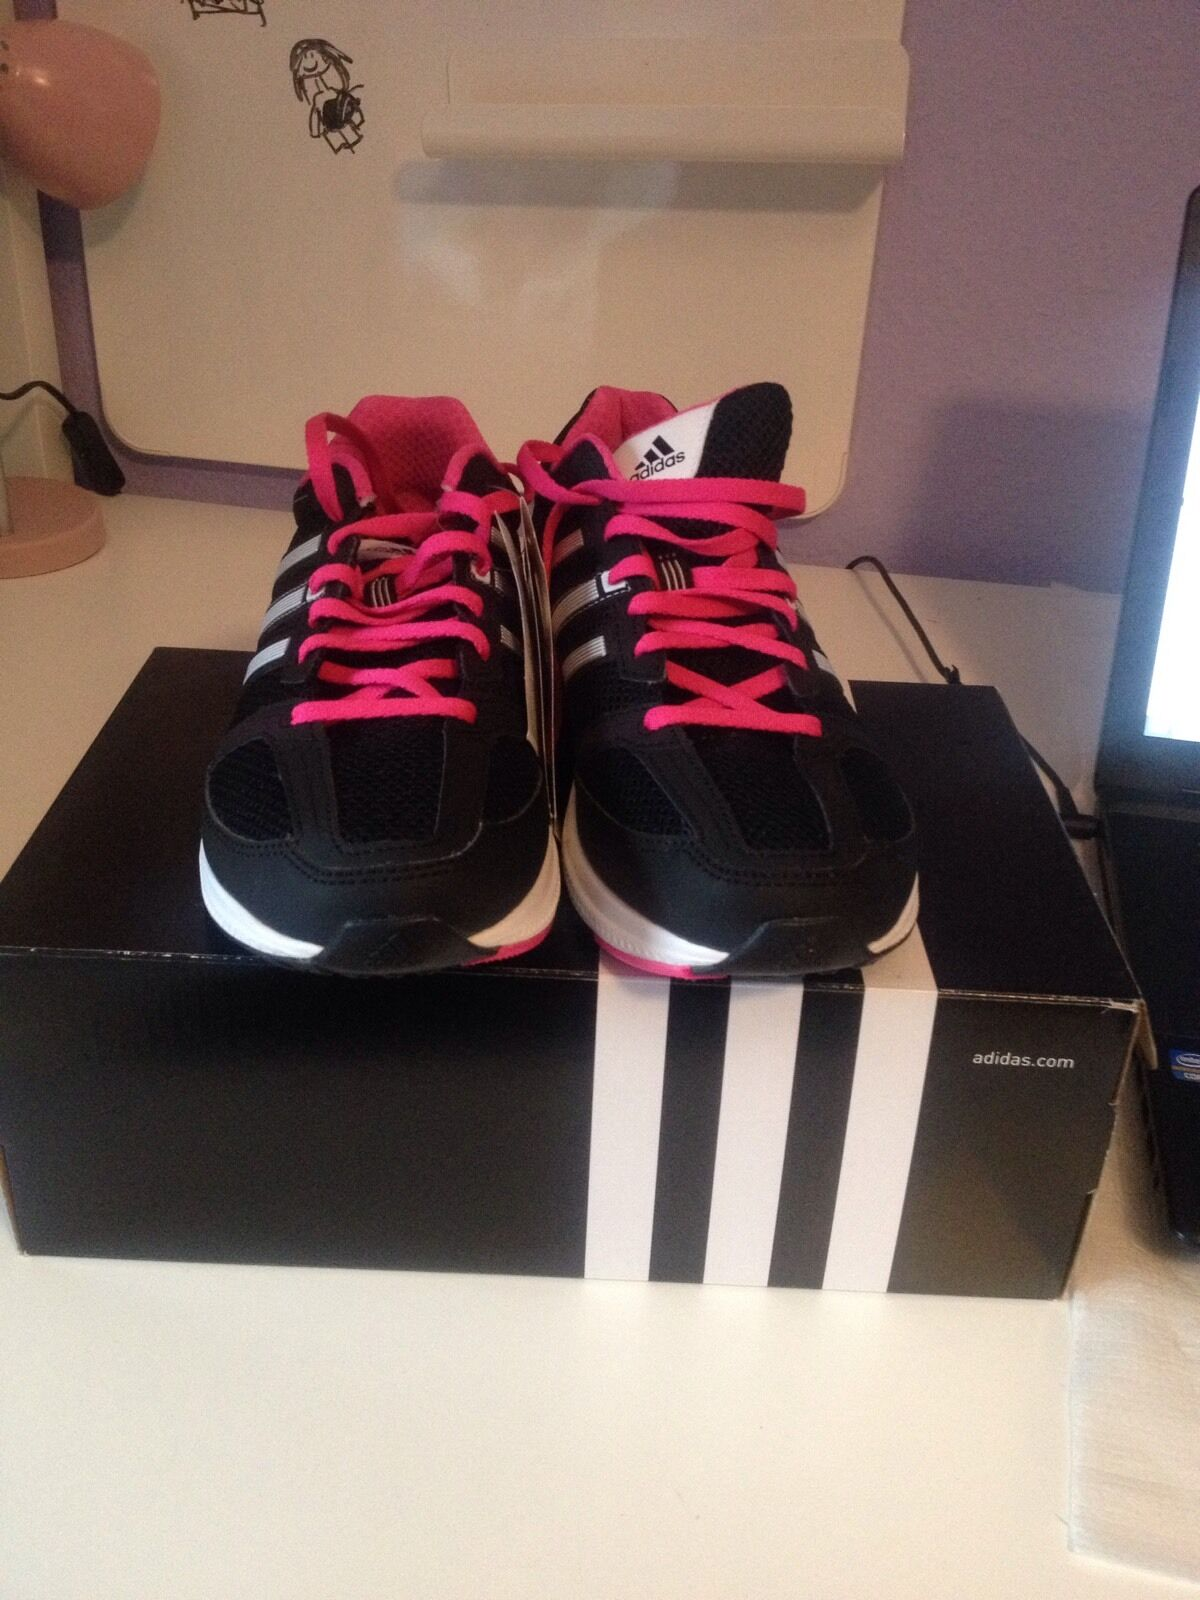 Adidas mana rc rc rc bounce W Damen Runningschuhe Gr 40 2 3 (AQ5449) Neu in Karton 80a524